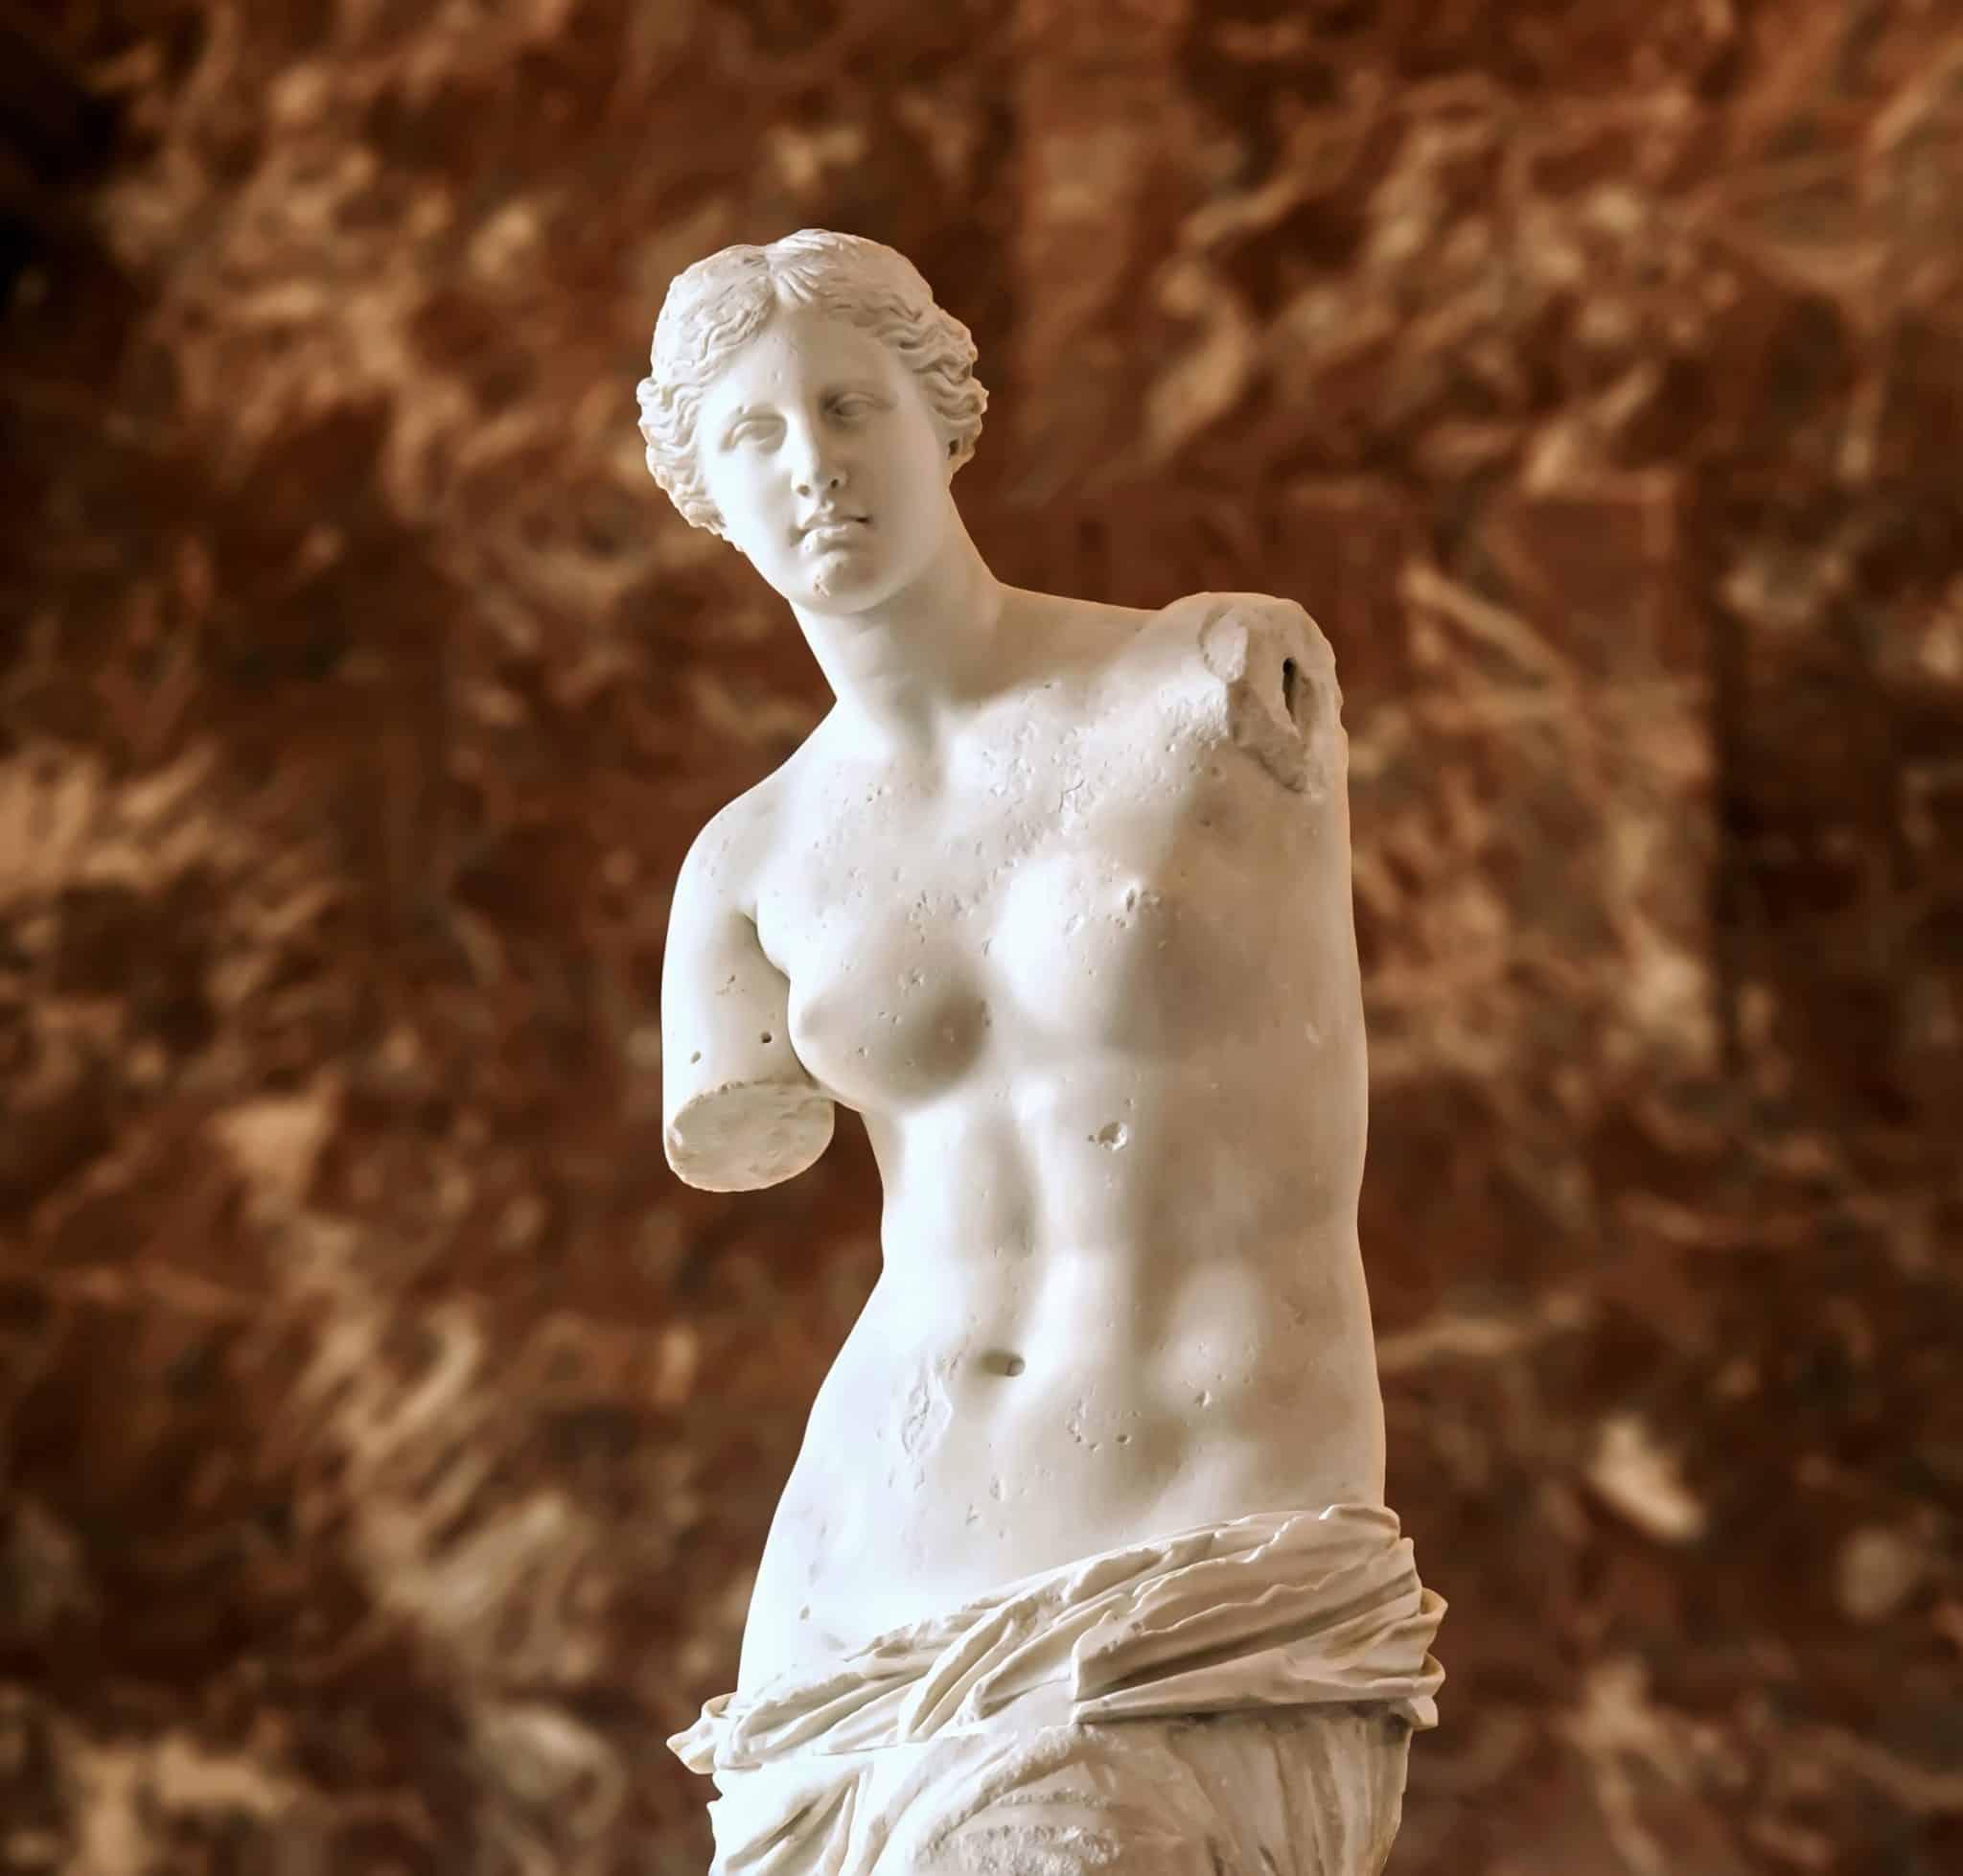 Venus de Milo, a Greek sculpture in the Louvre, where to go in Paris for 4 days